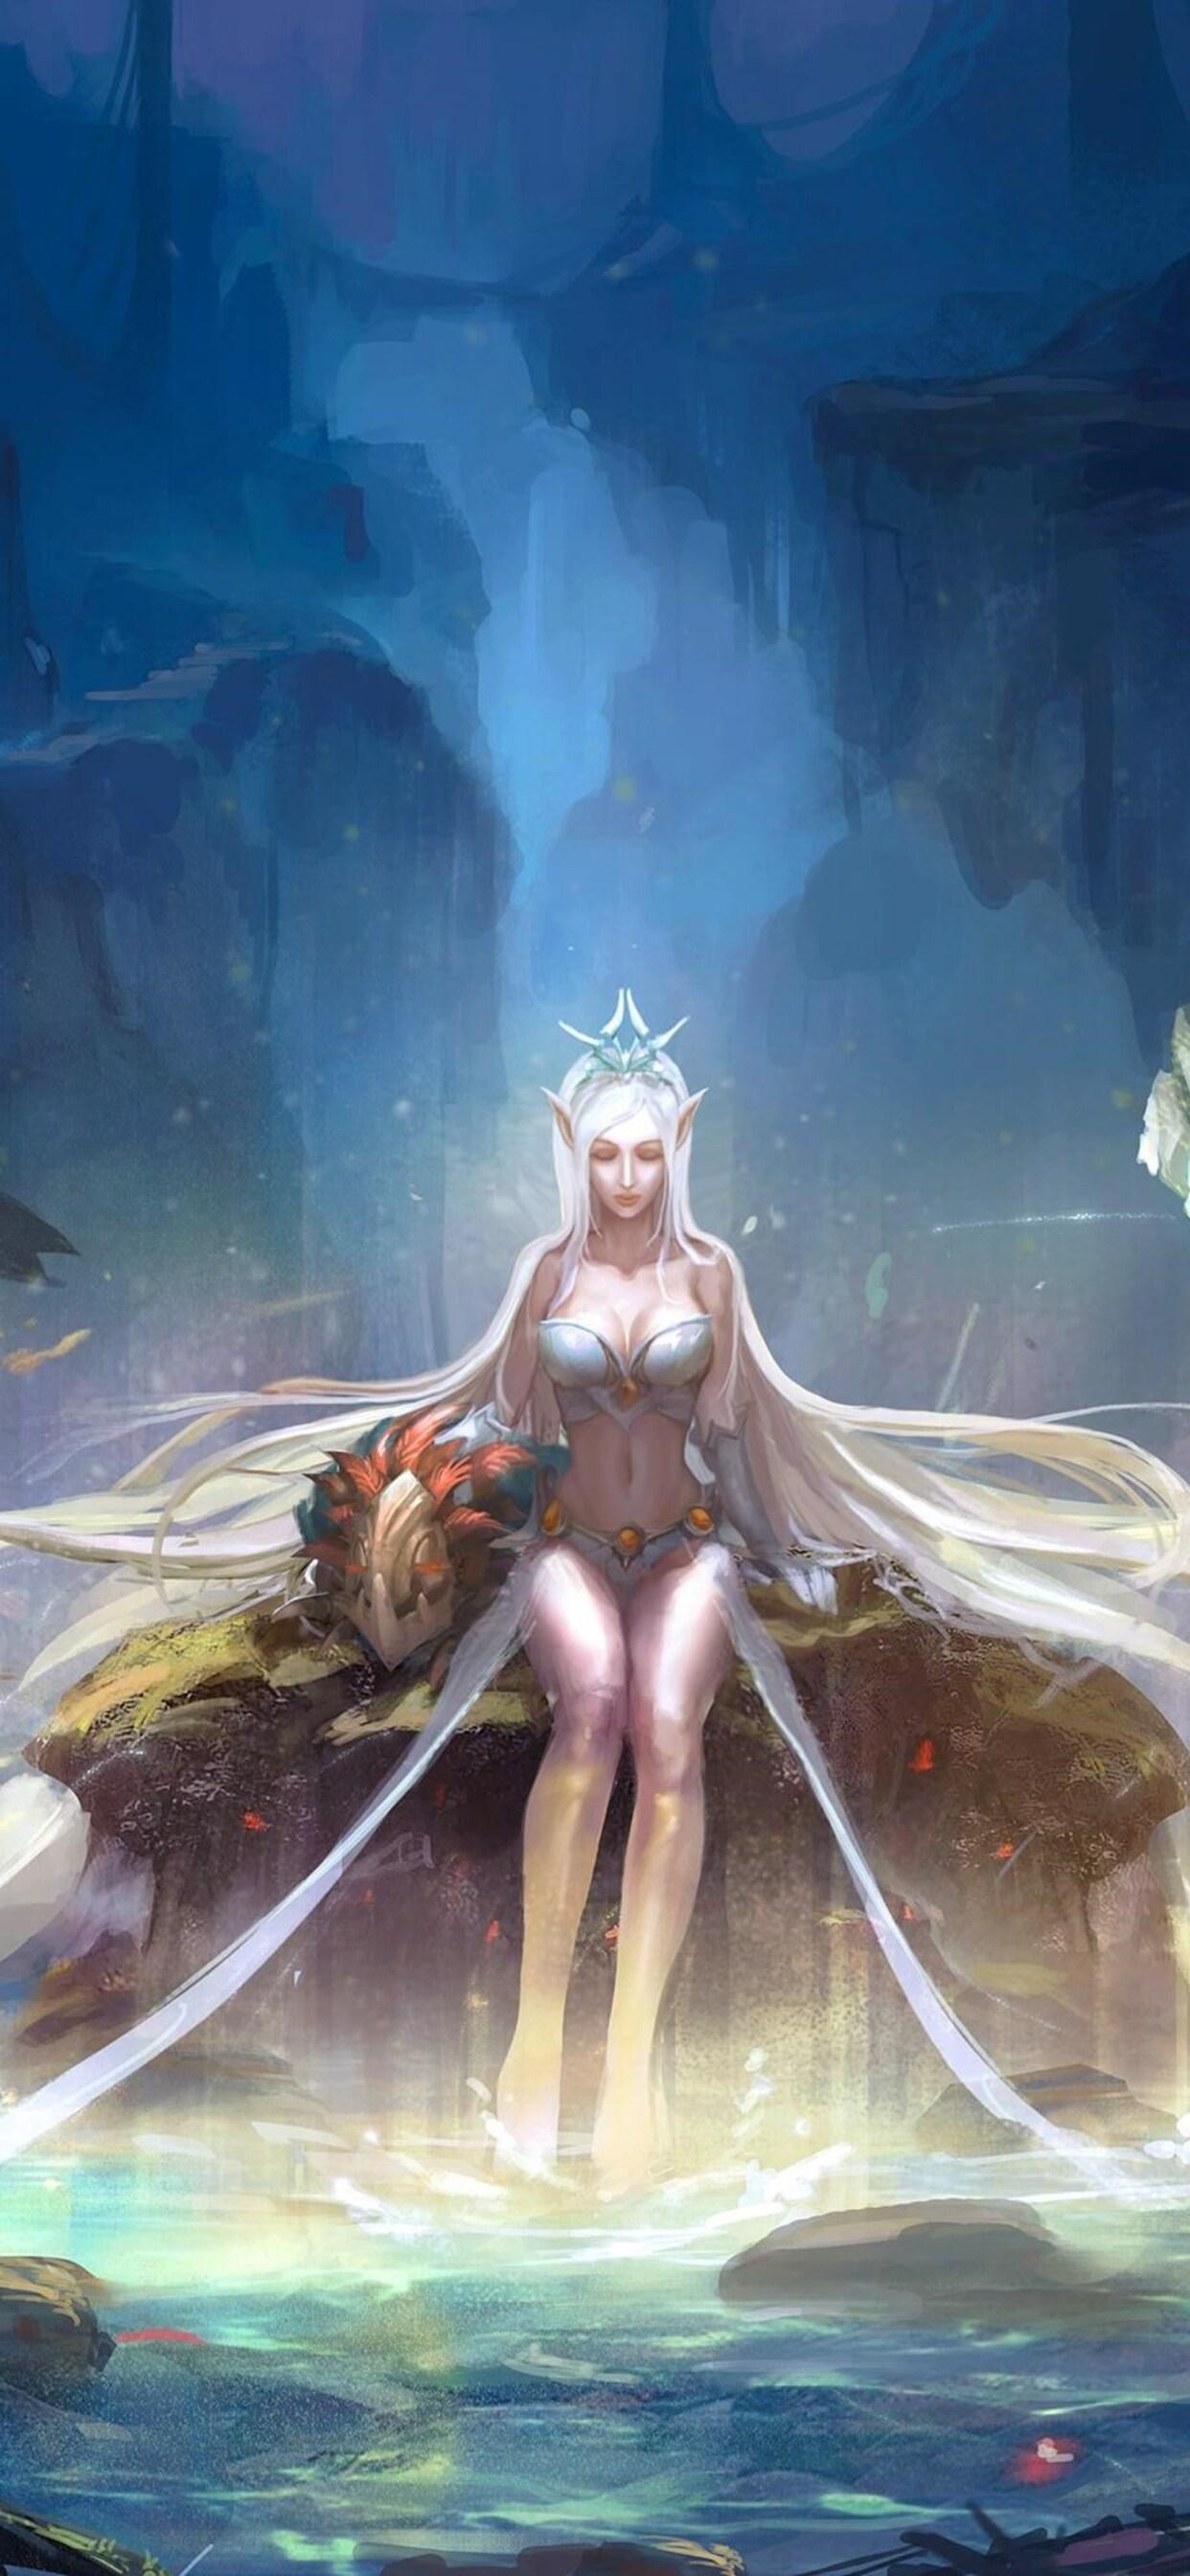 League Of Legends Wallpaper Iphone Hd League Of Legends